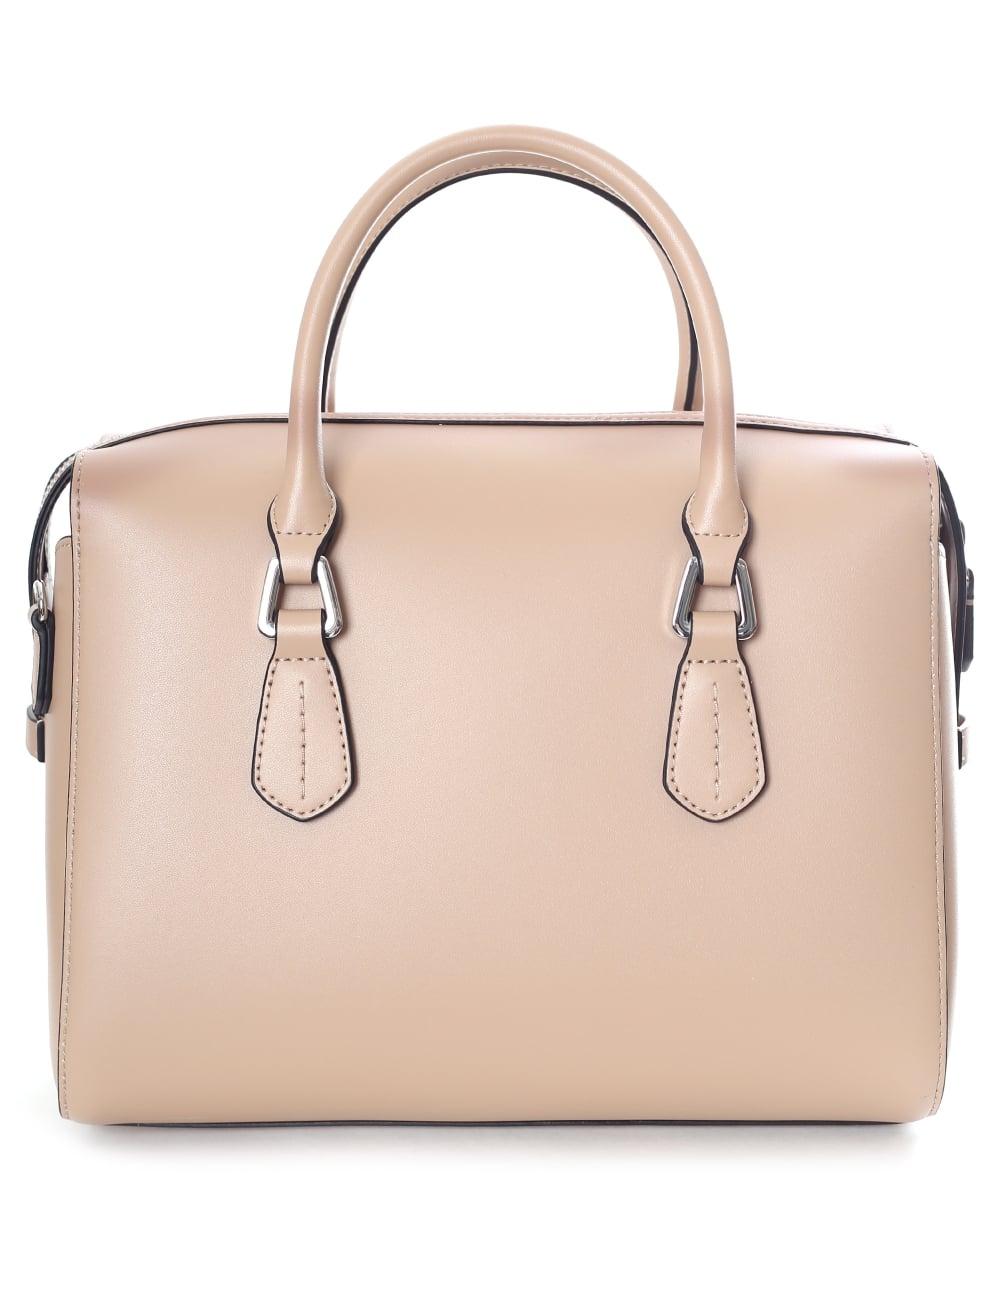 Armani Jeans Women s Wilma Bowling Bag 01de0b28f4d39